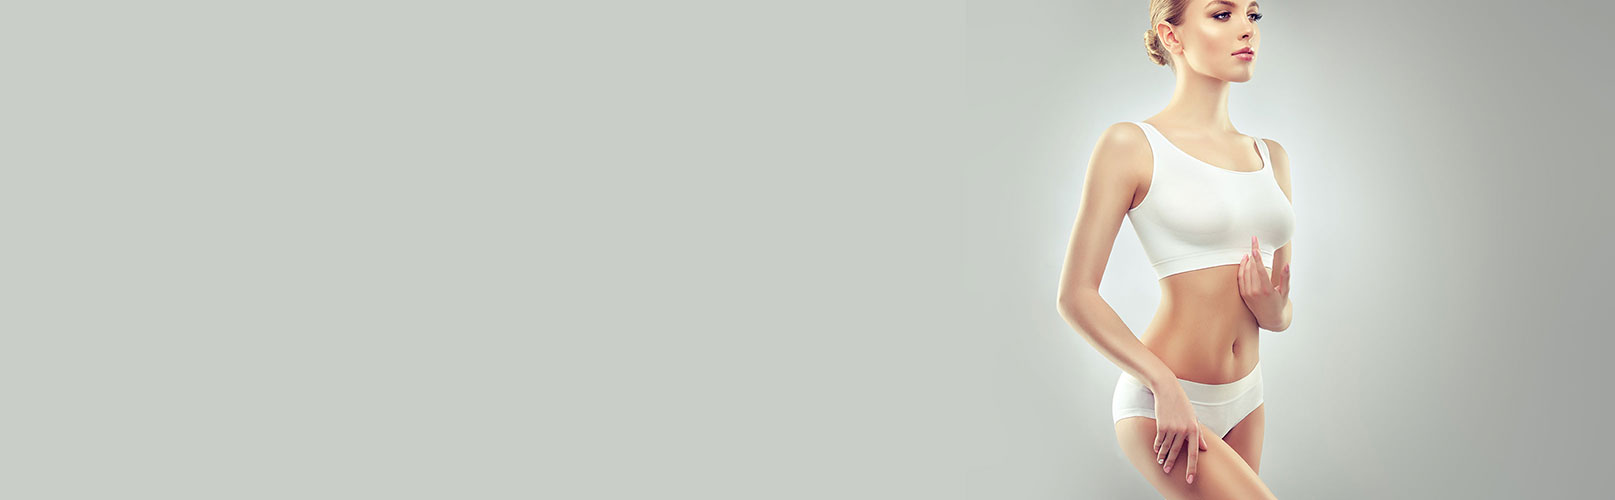 La liposuccion à Lyon - Chirurgie esthétique | Dr Corniglion